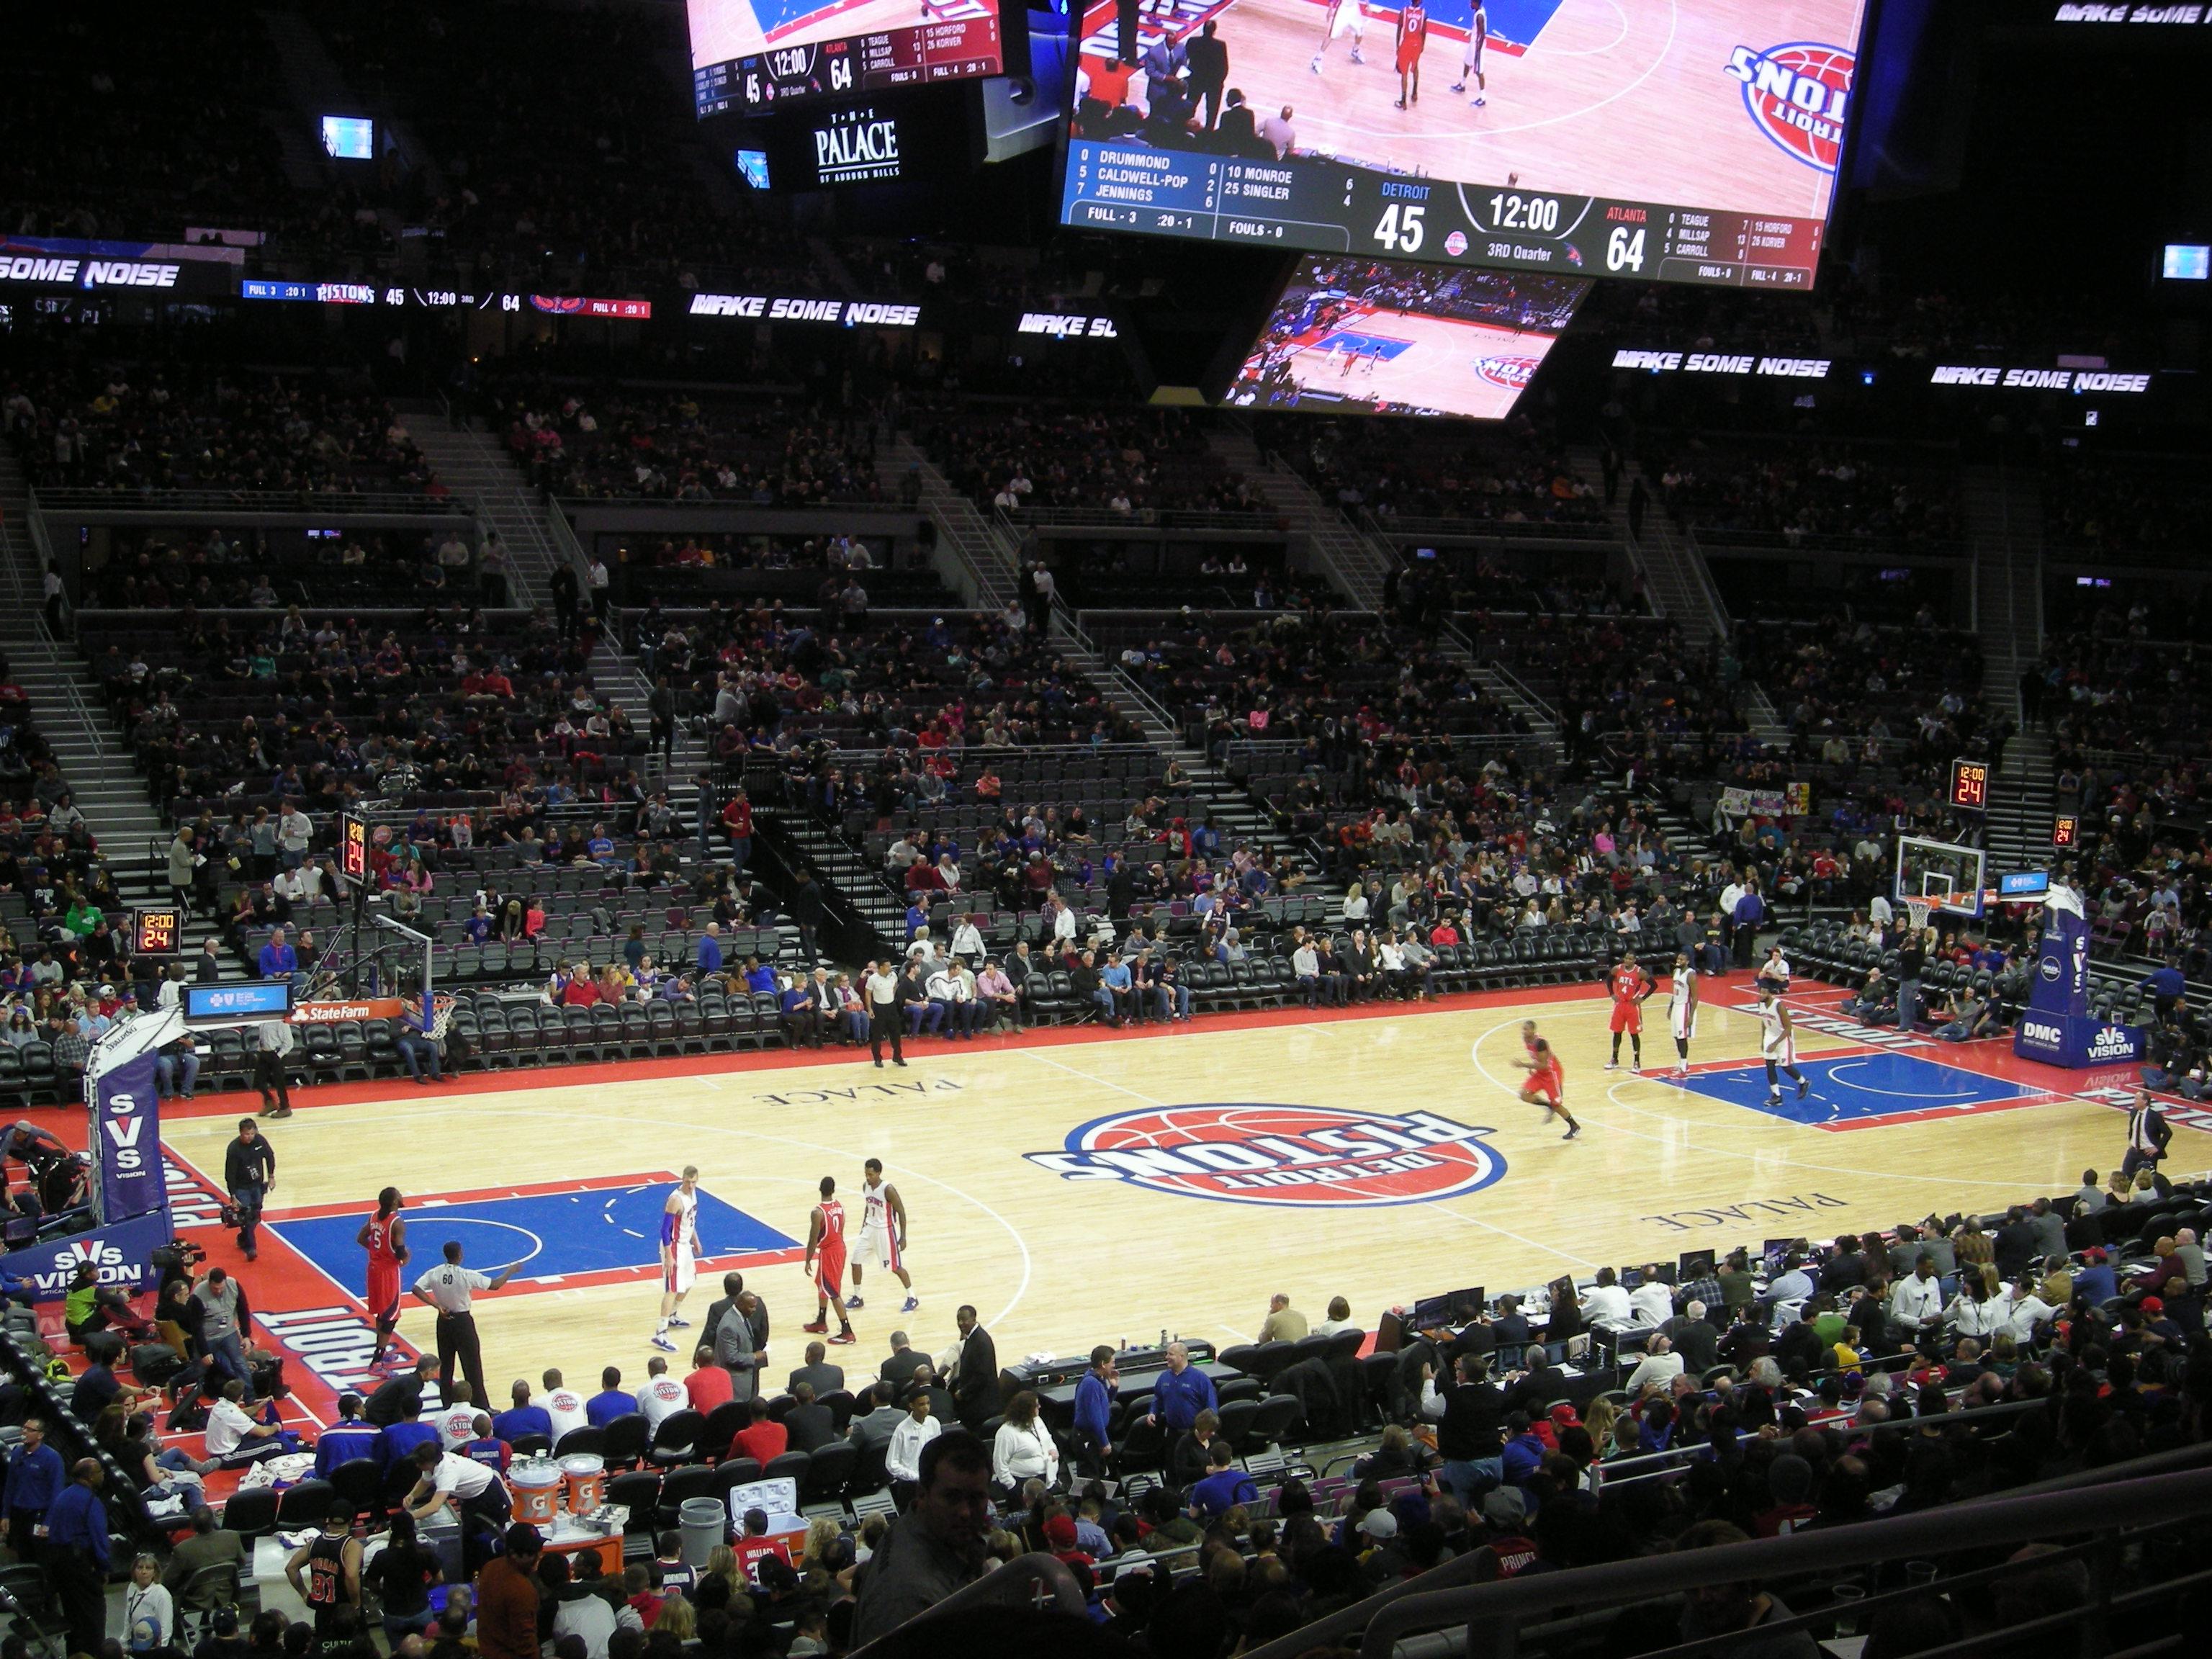 File:Atlanta Hawks vs. Detroit Pistons January 2015 08.jpg ...